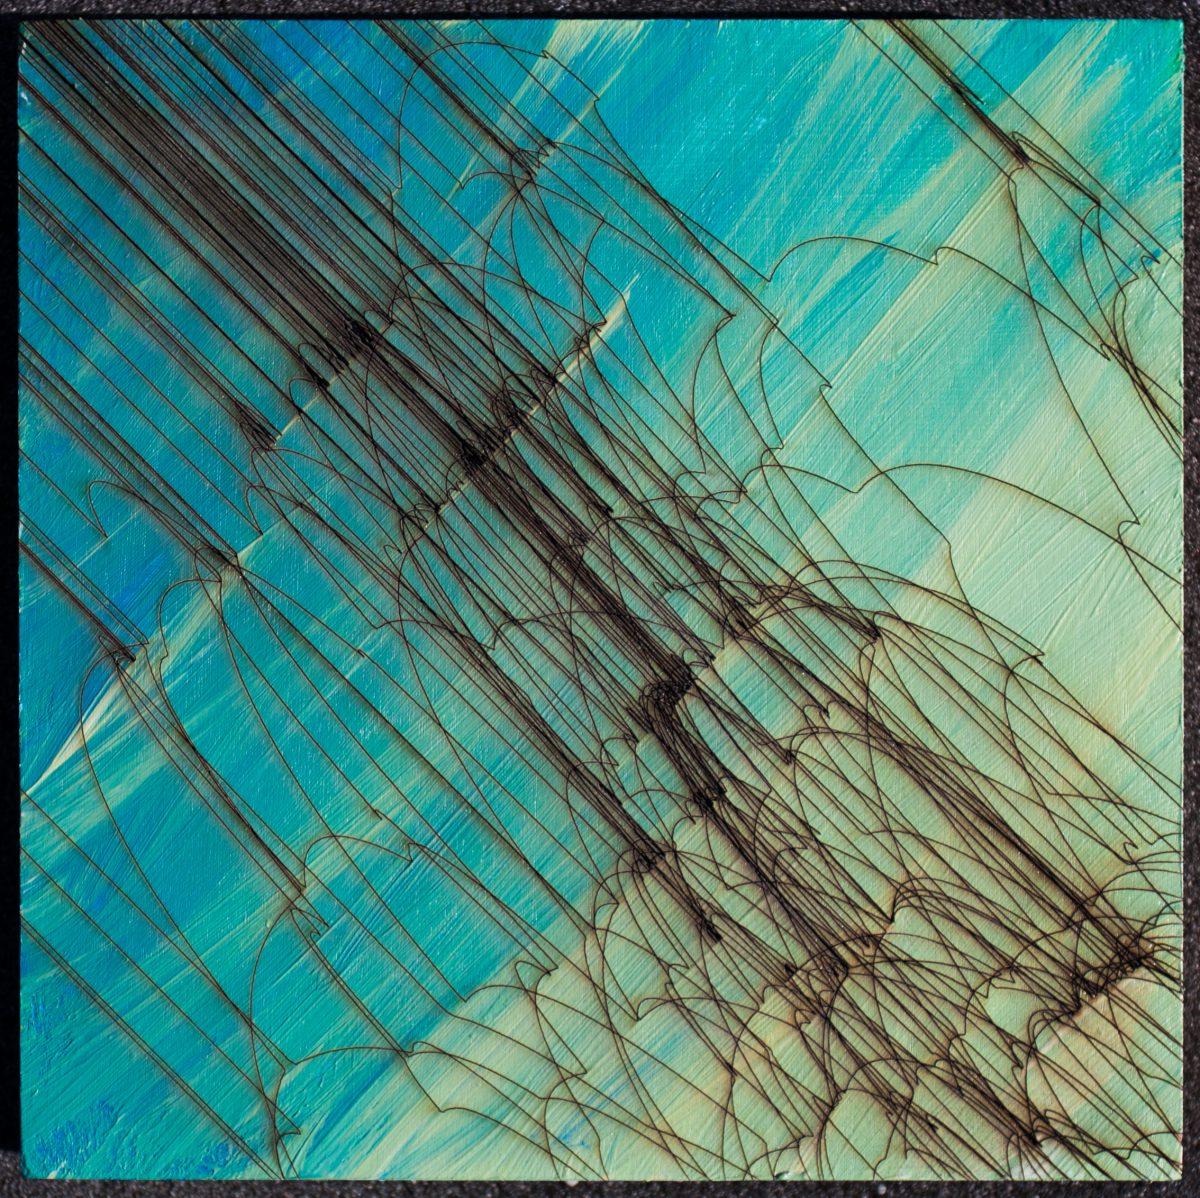 waterfall 02 - 15x15cm laser cut, wooden panel, acrylics, ch3, digital, illustration, wood, acrylic, laser